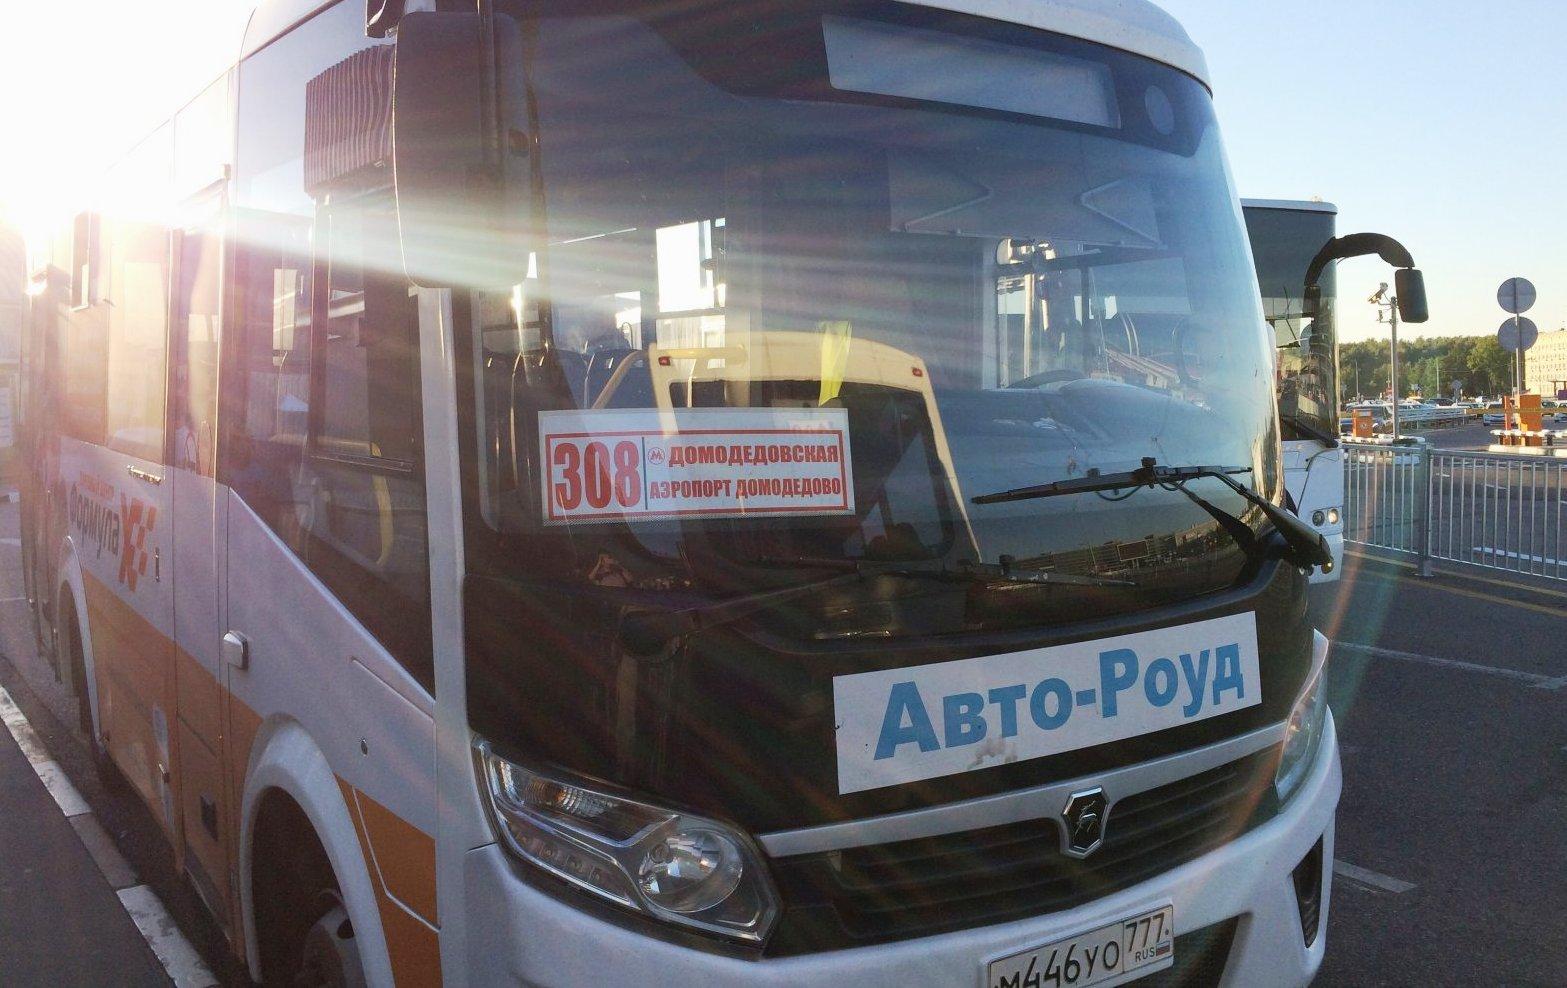 Автобус до Домодедово от метро